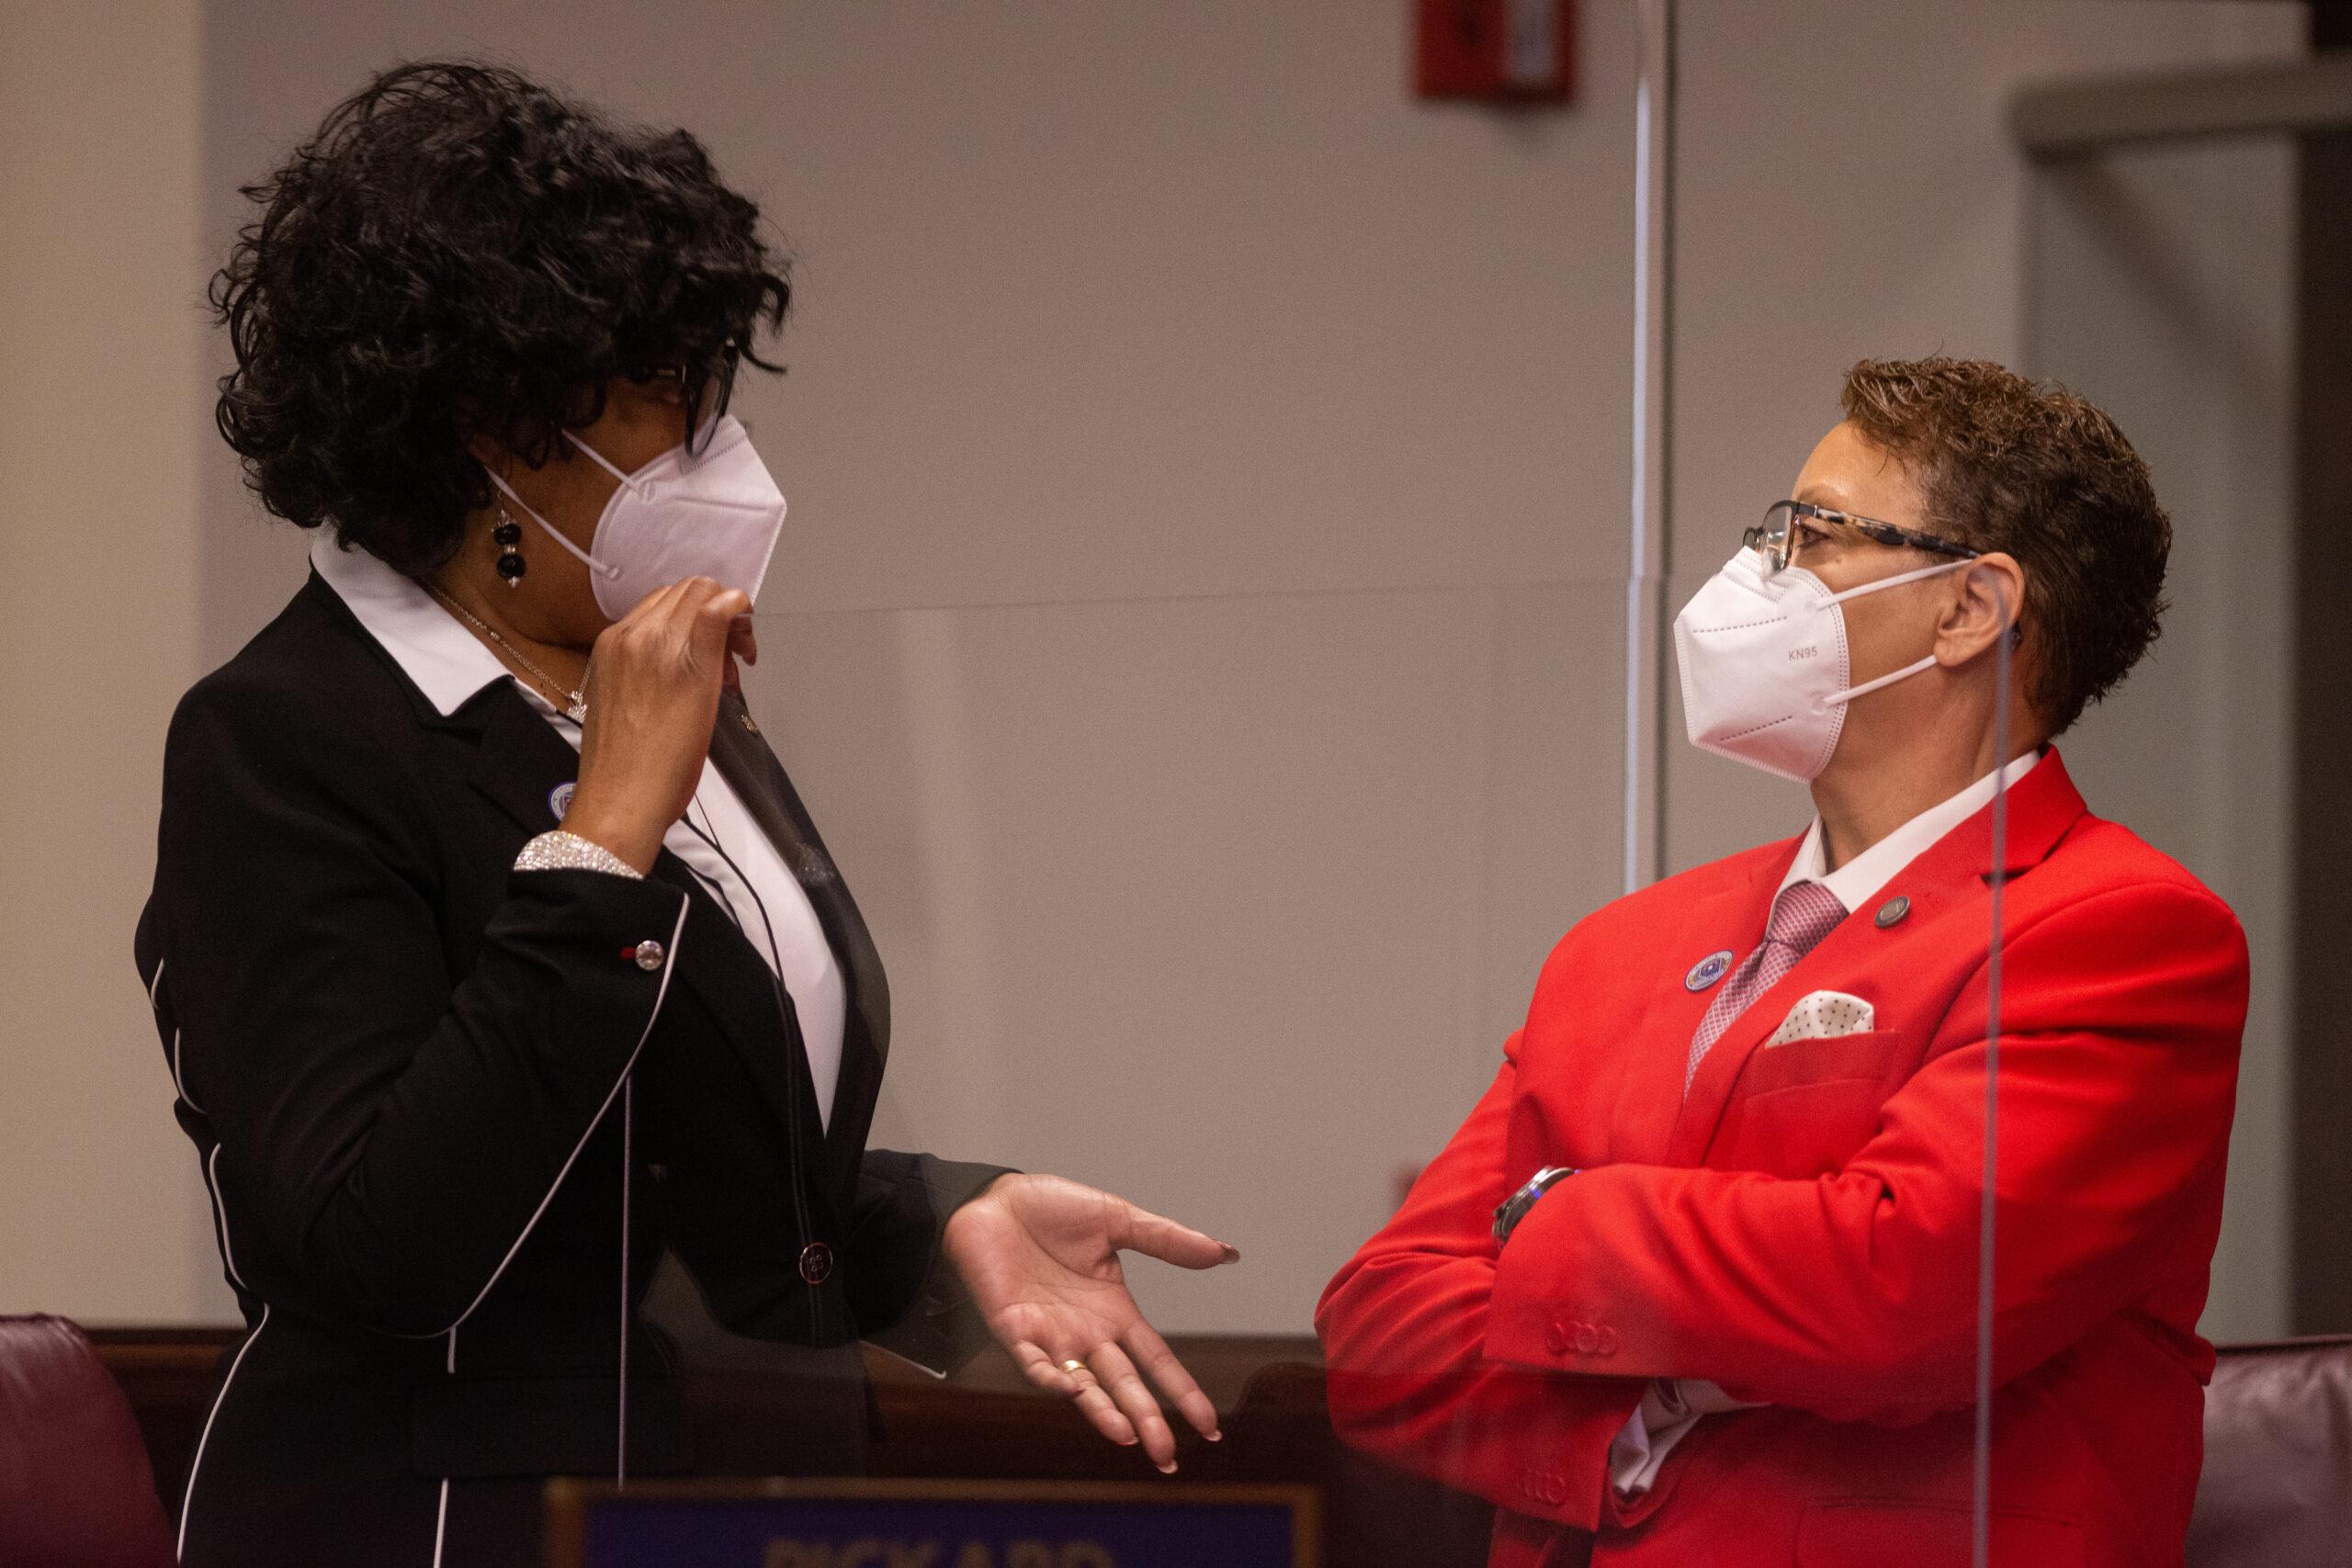 State Senators Marcia Washington, left, and Pat Spearman